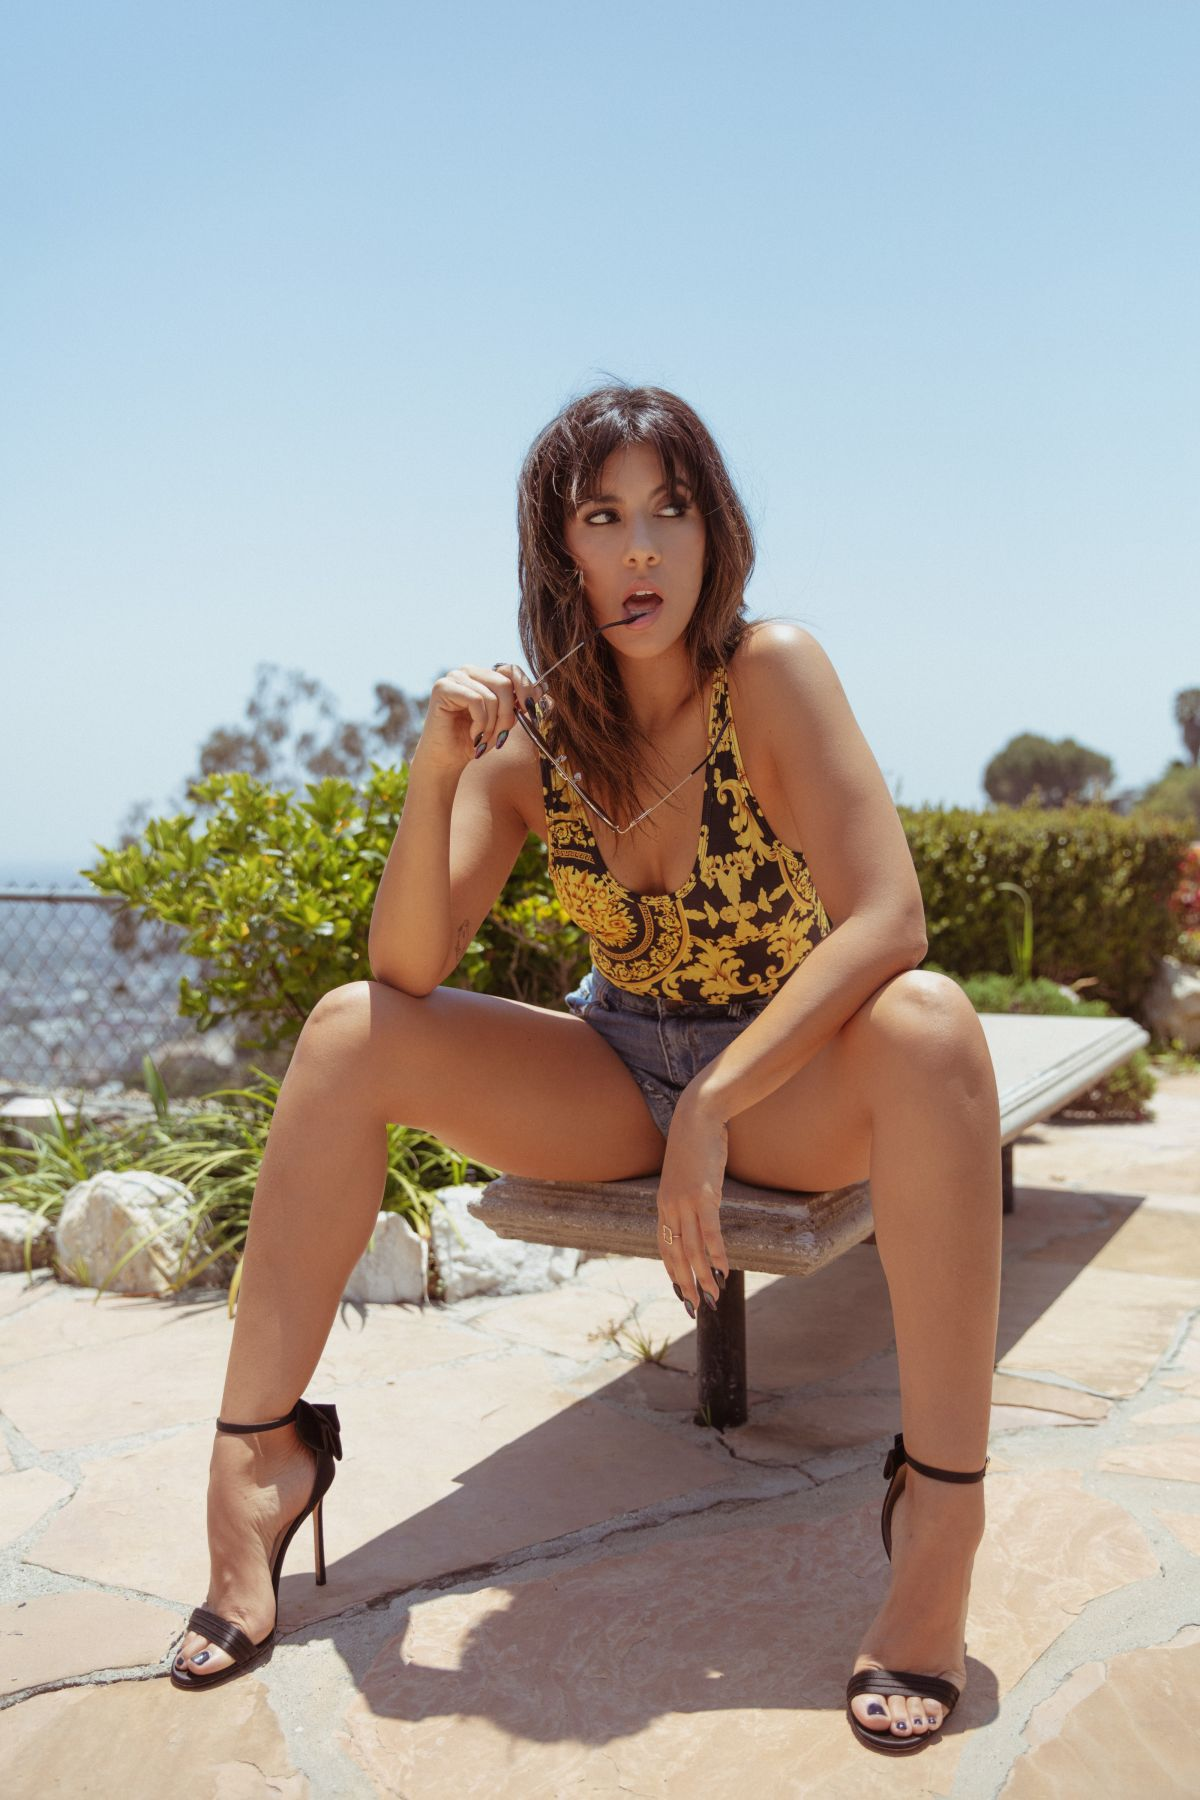 Erotica Stephanie Beatriz nude (98 foto and video), Ass, Paparazzi, Feet, panties 2018